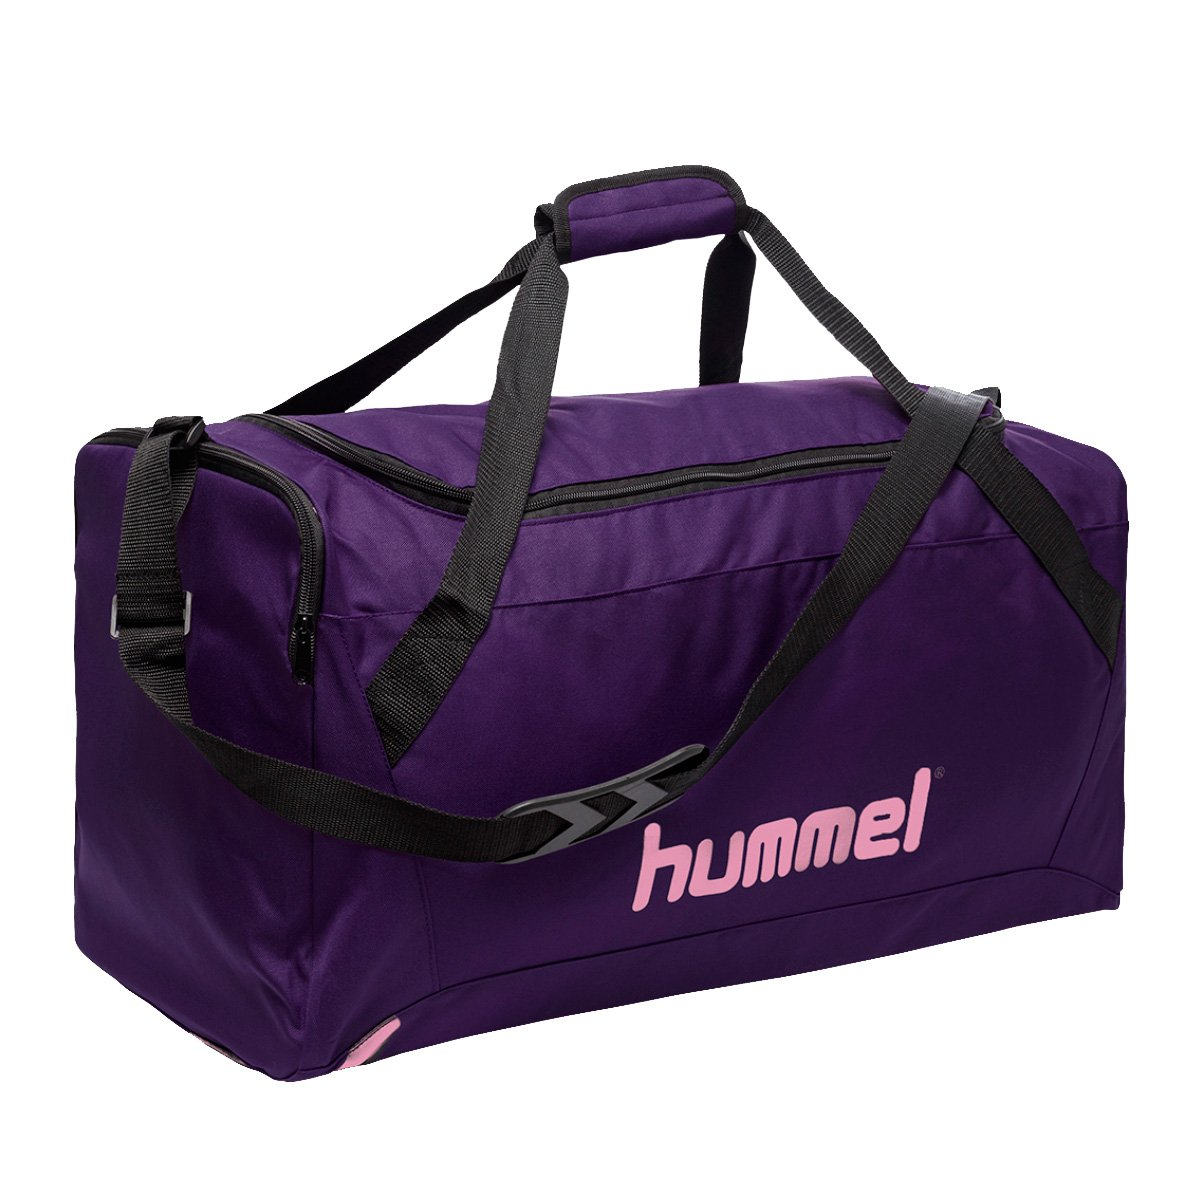 Køb Hummel Core Sportstaske, lilla – medium